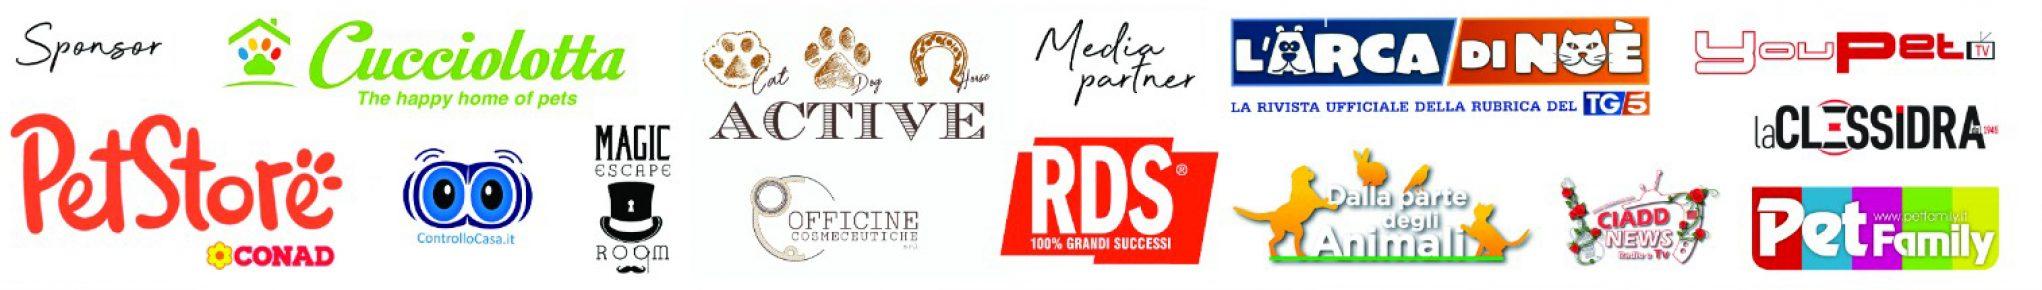 PCFF-2020_Sponsor-mediapartner